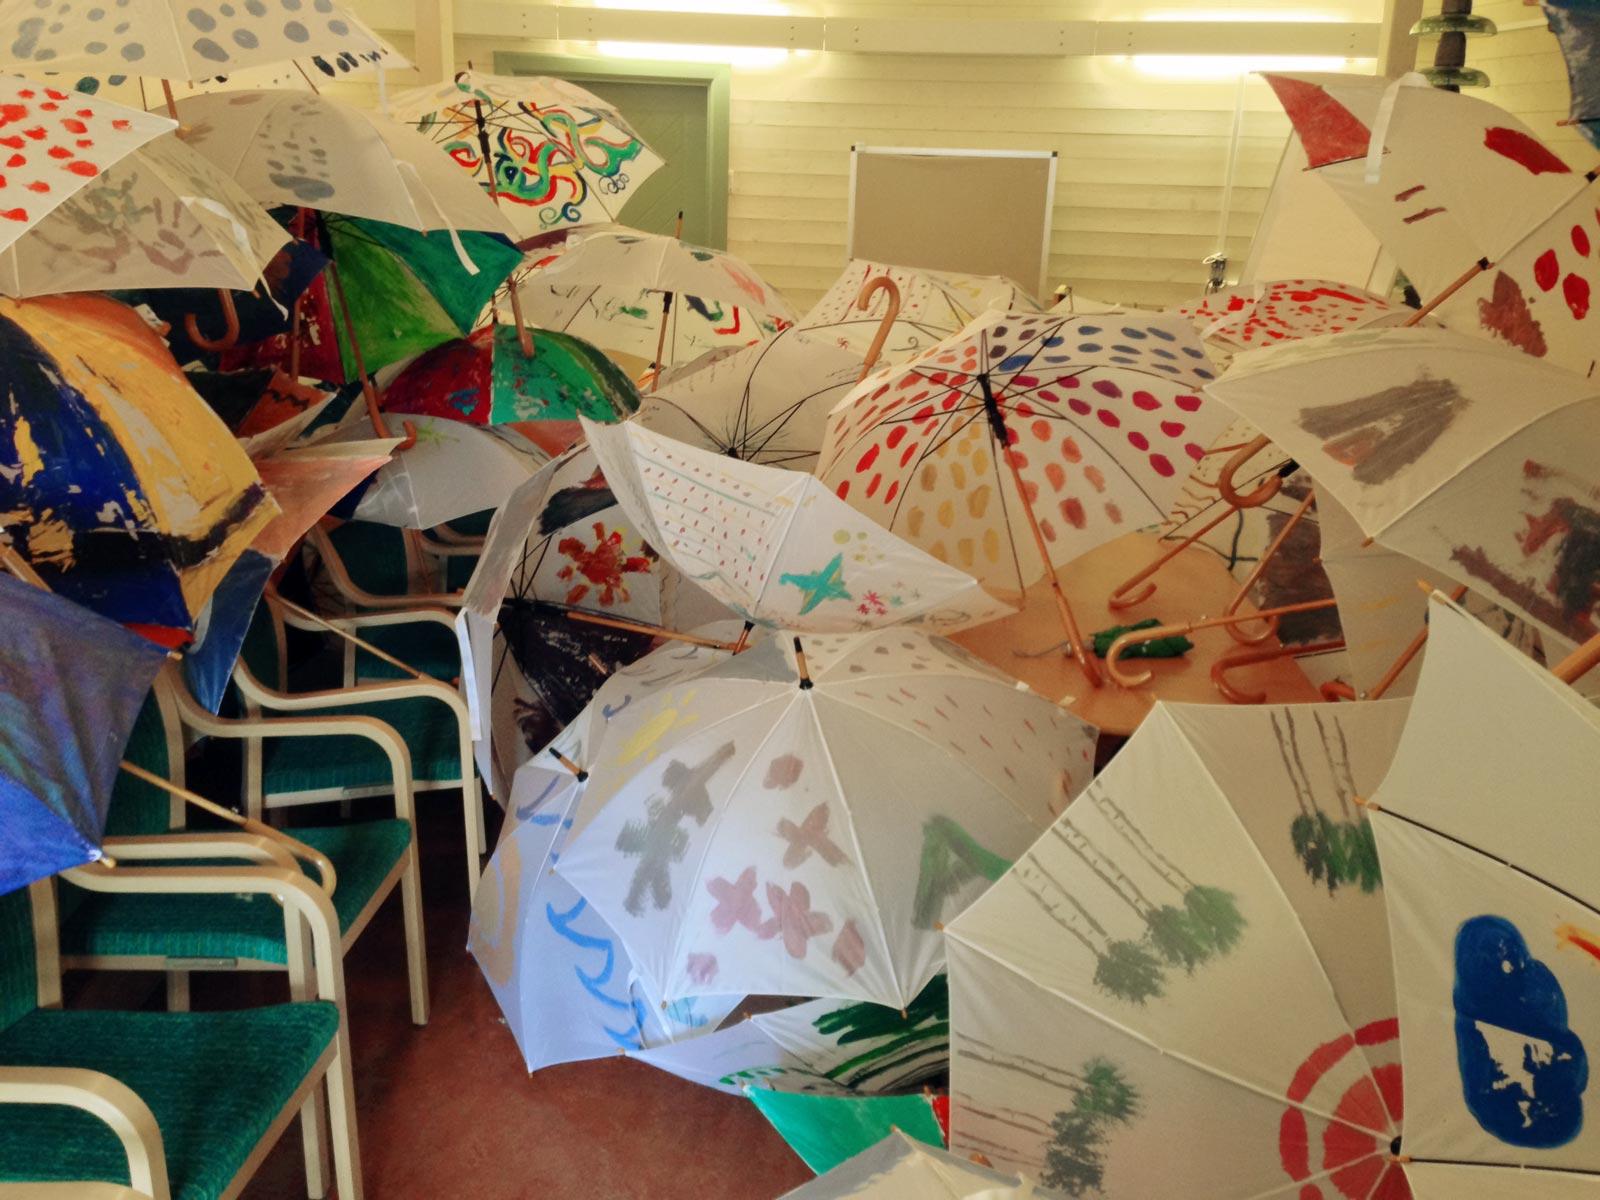 Behöver du paraplyer? Vi har paraplyer.